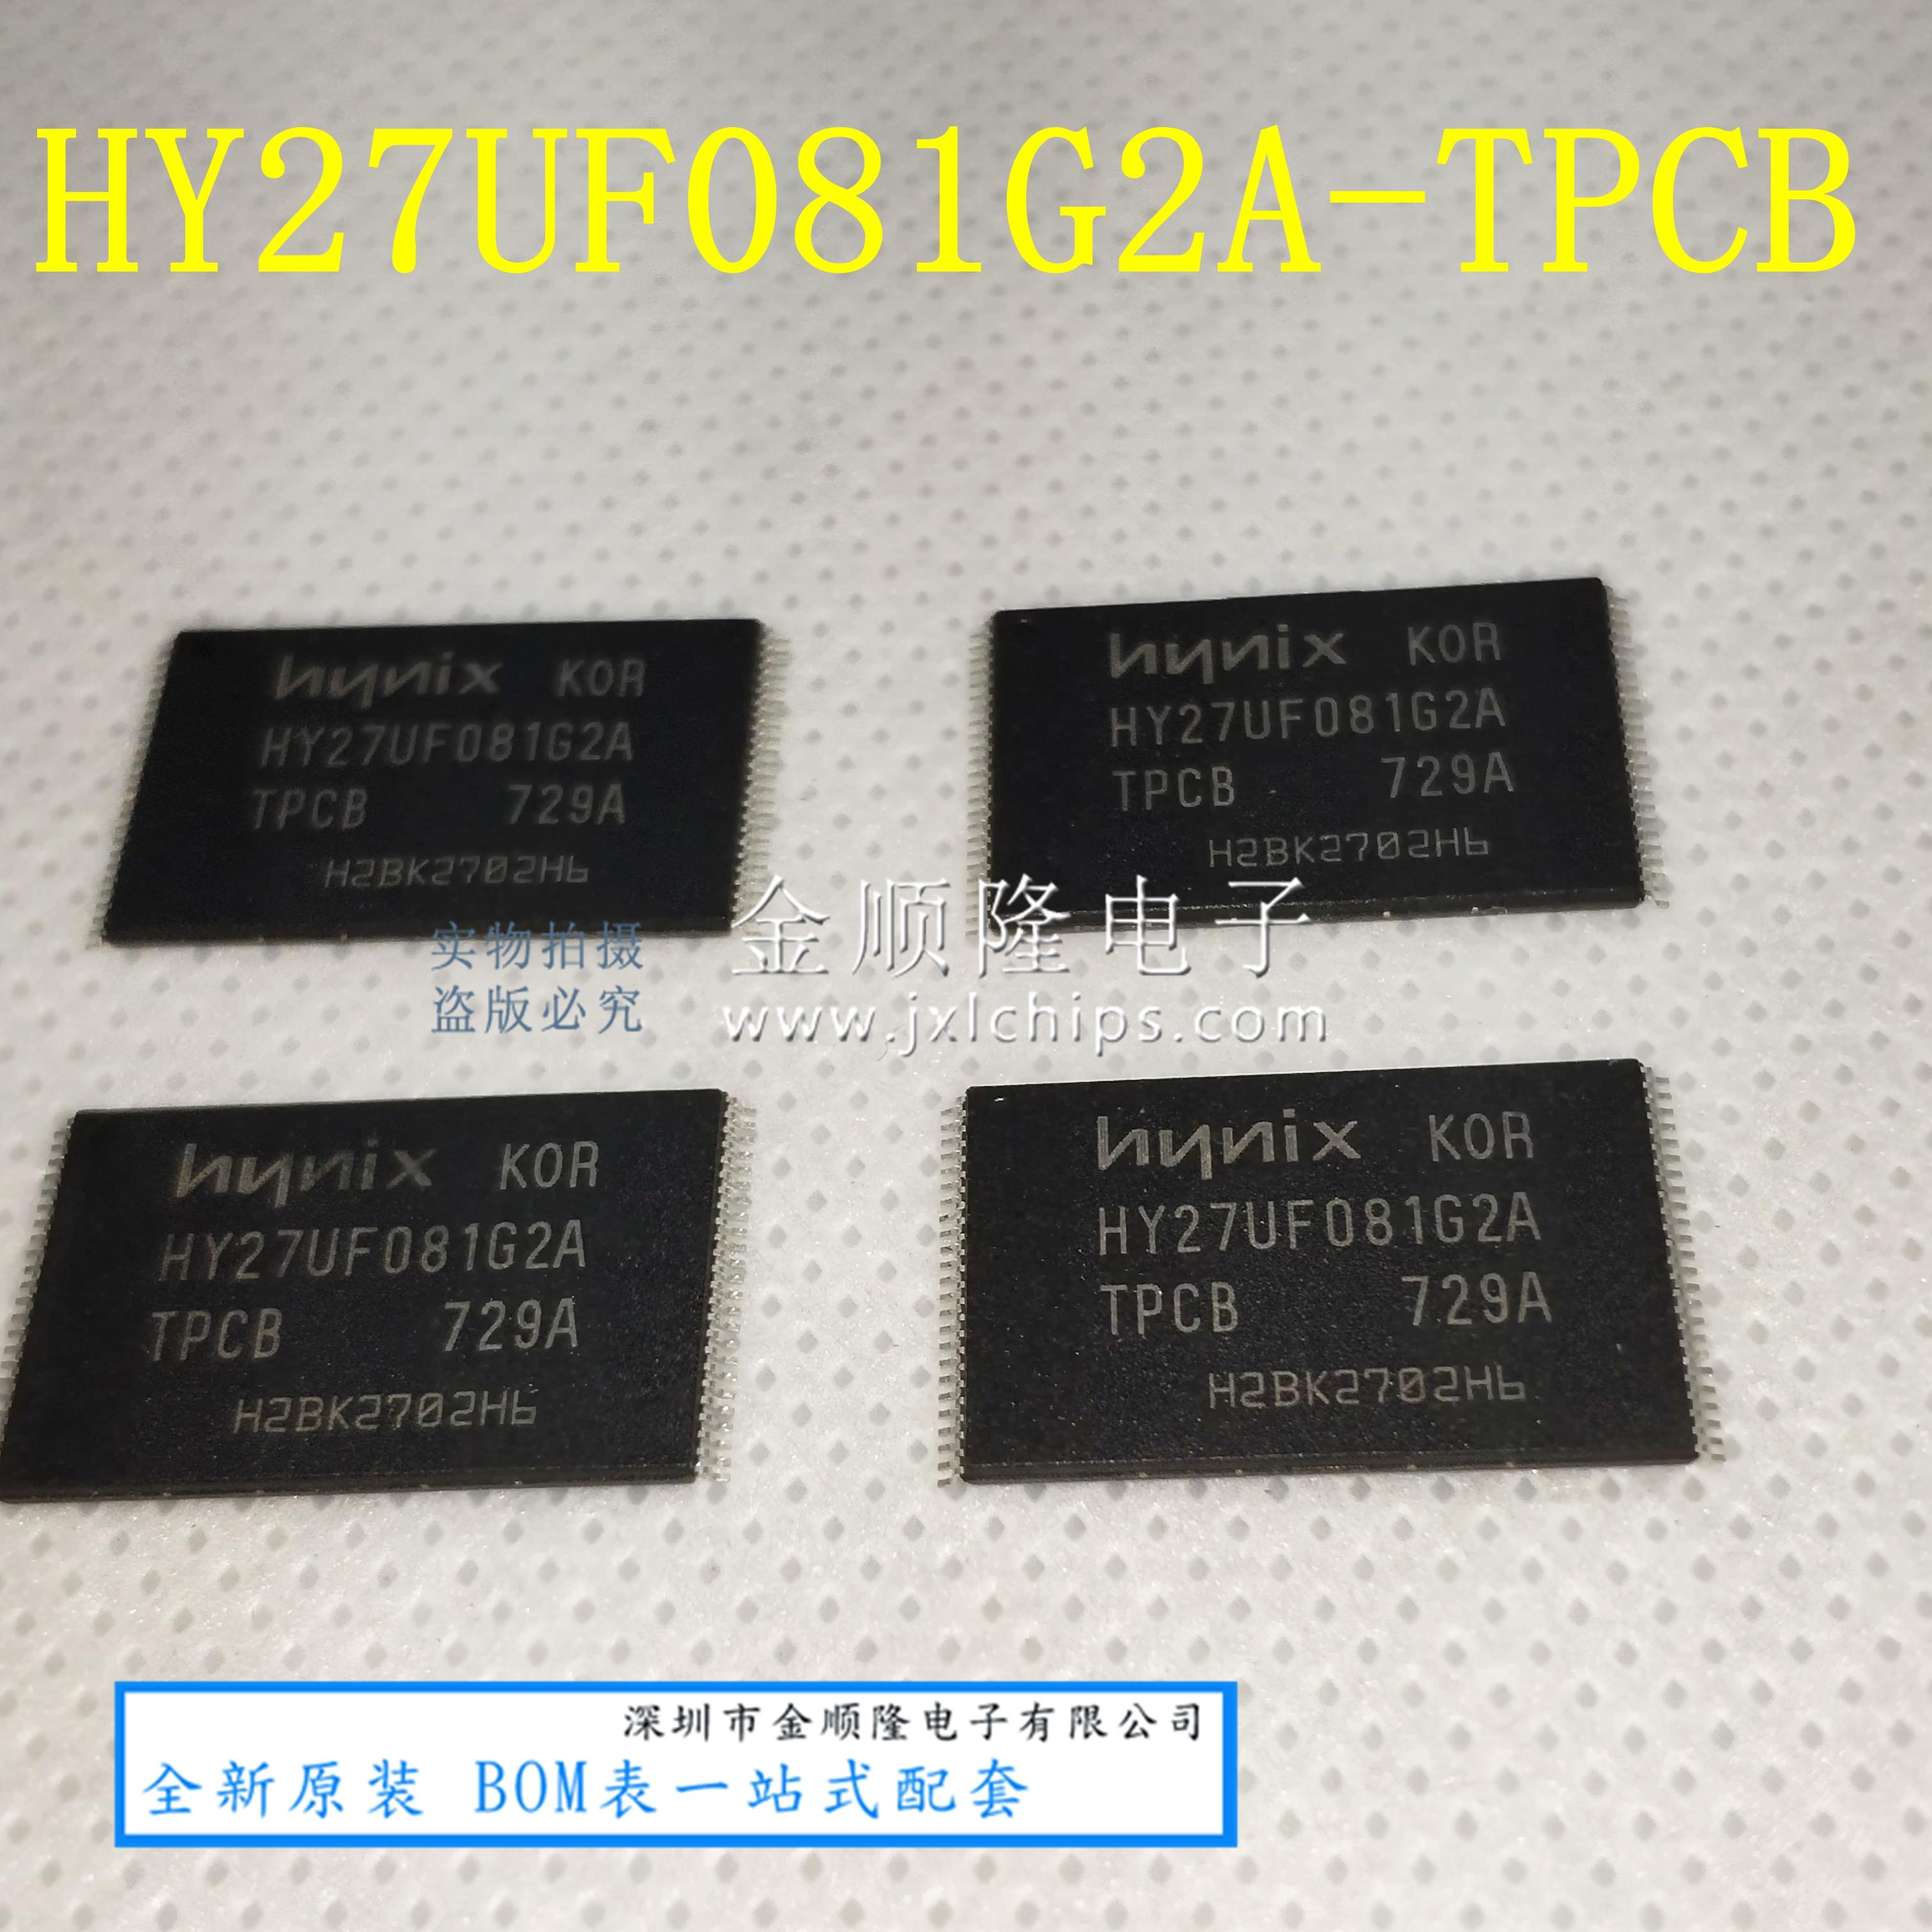 5 peças HY27UF081G2A-TPCB HY27UF081G2A FLASH TSOP